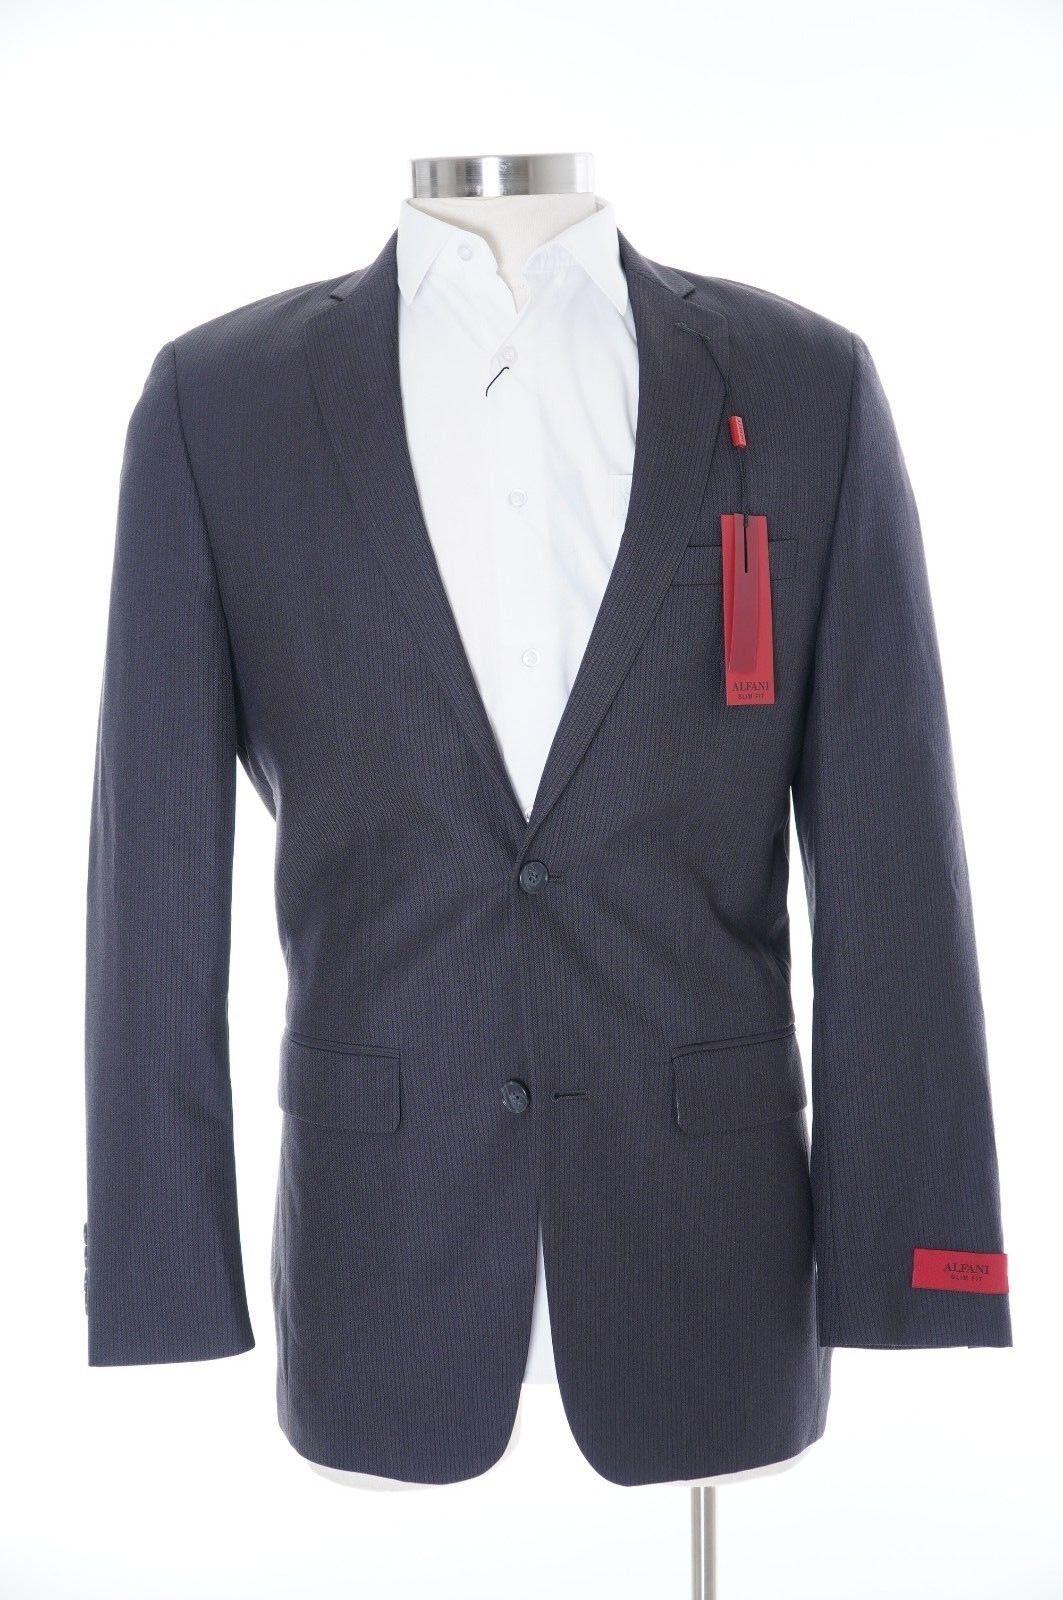 Alfani ROT Slim Fit Charcoal Tonal Striped Two Button Suit Blazer 46R